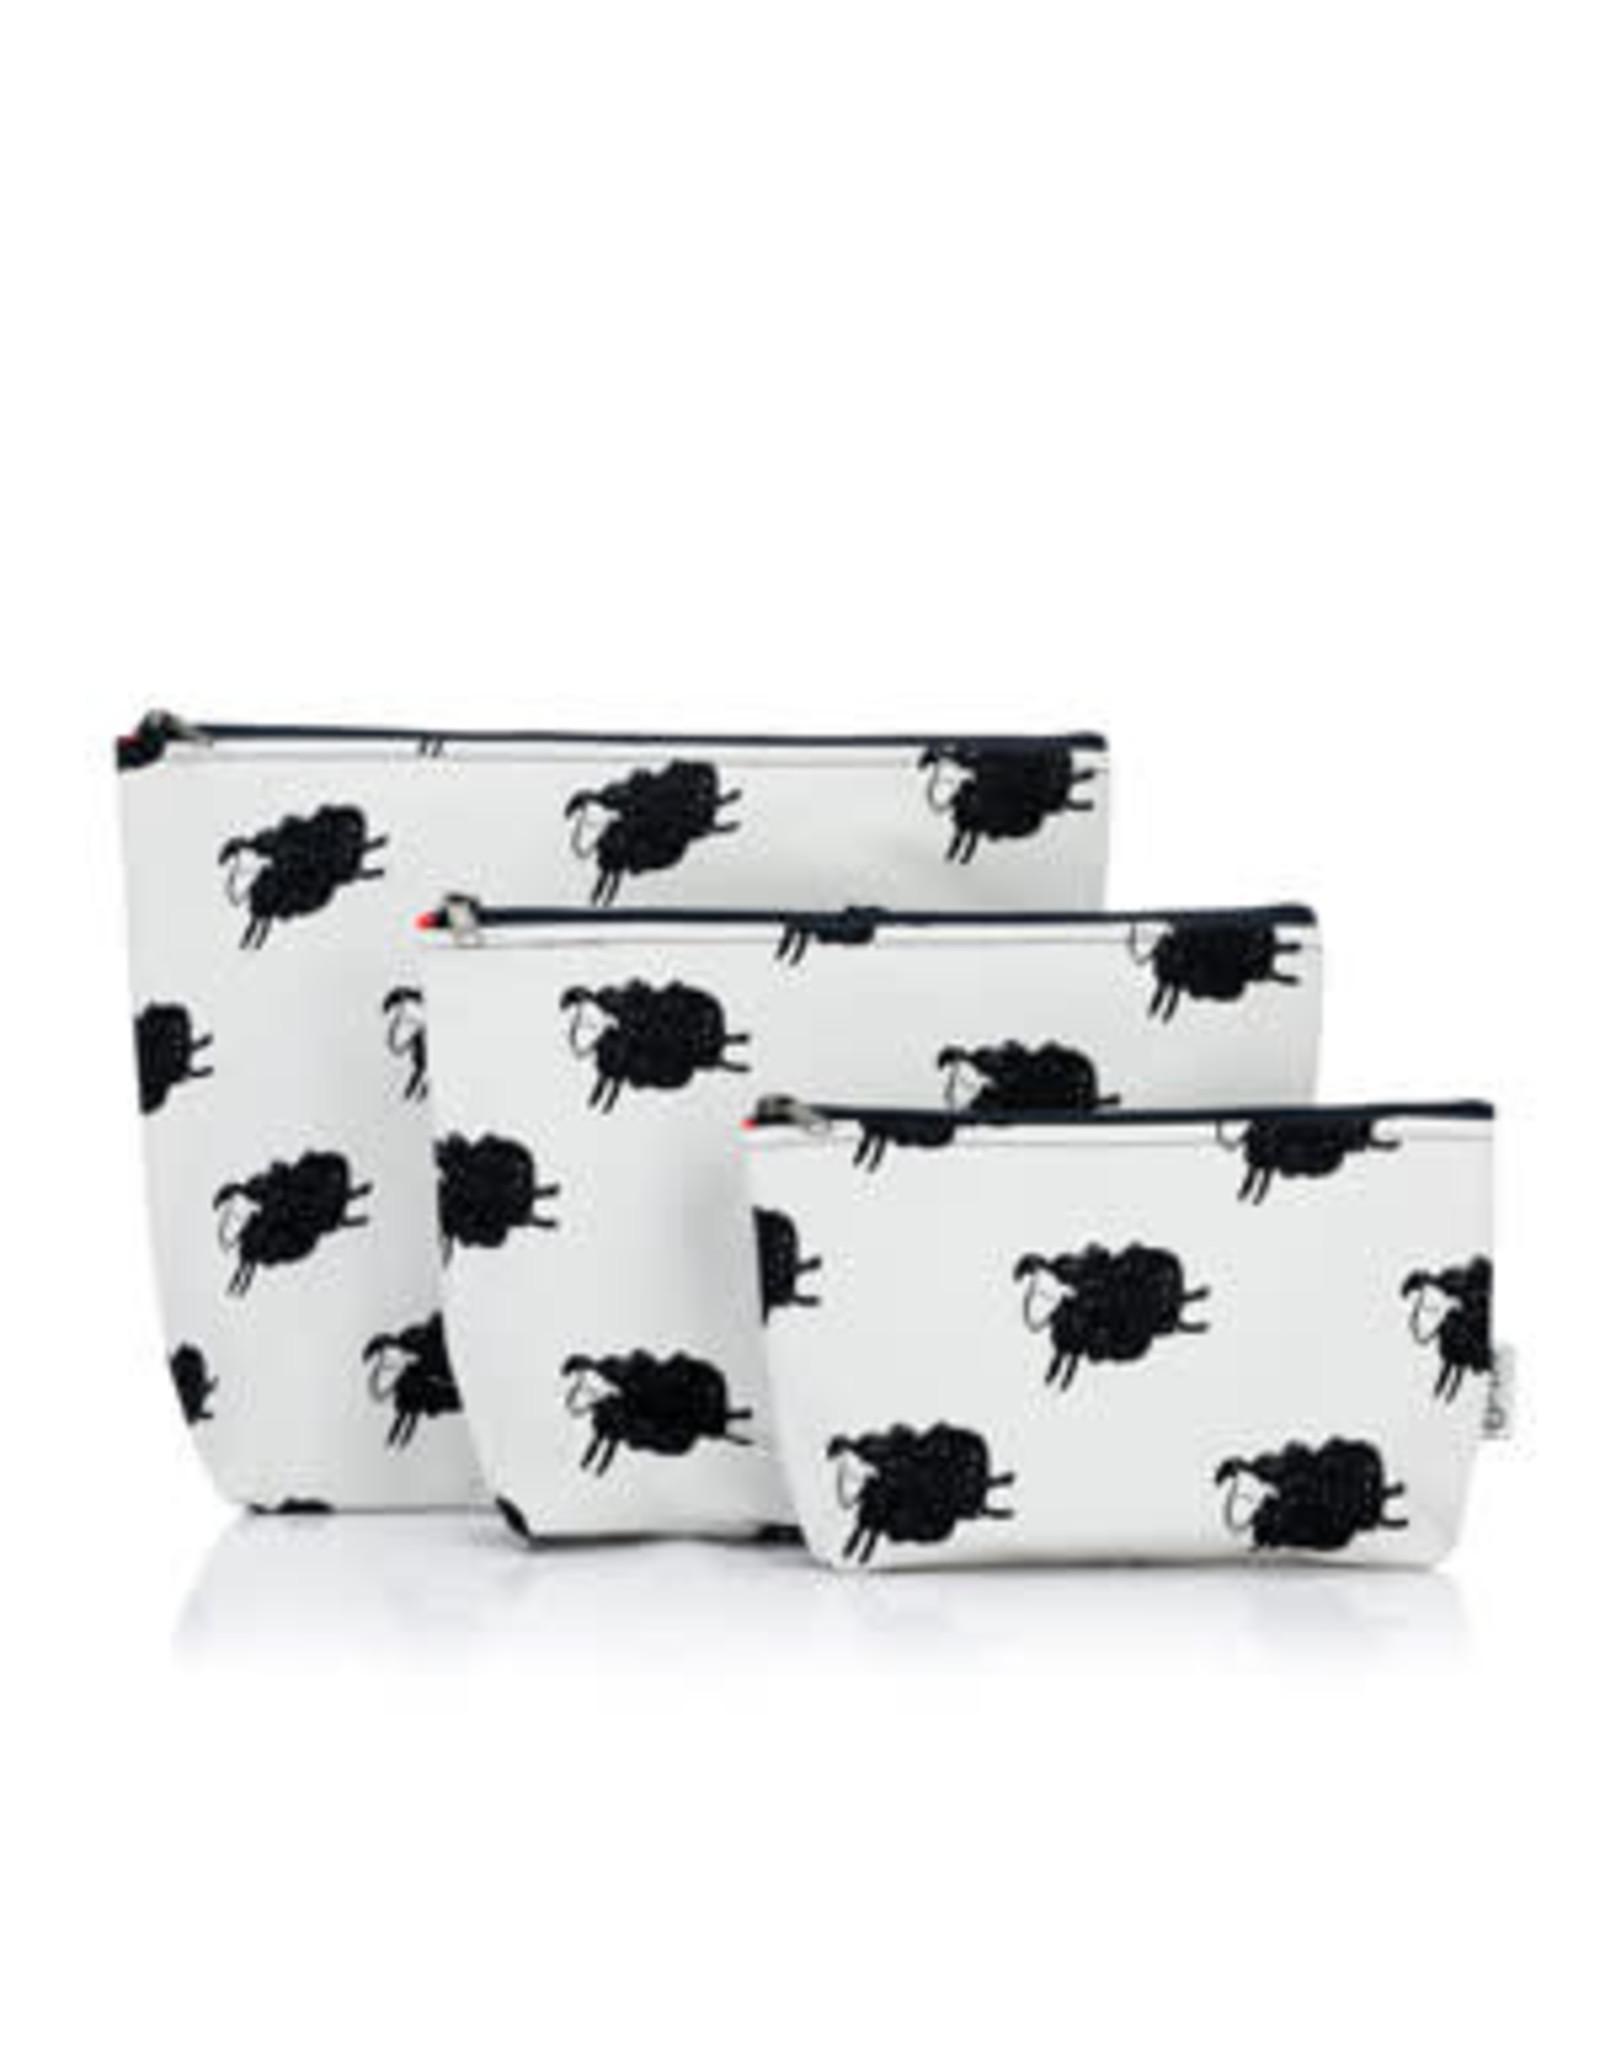 Della Q - Mesh + Zip Collection - Sheep/Red Cotton Print